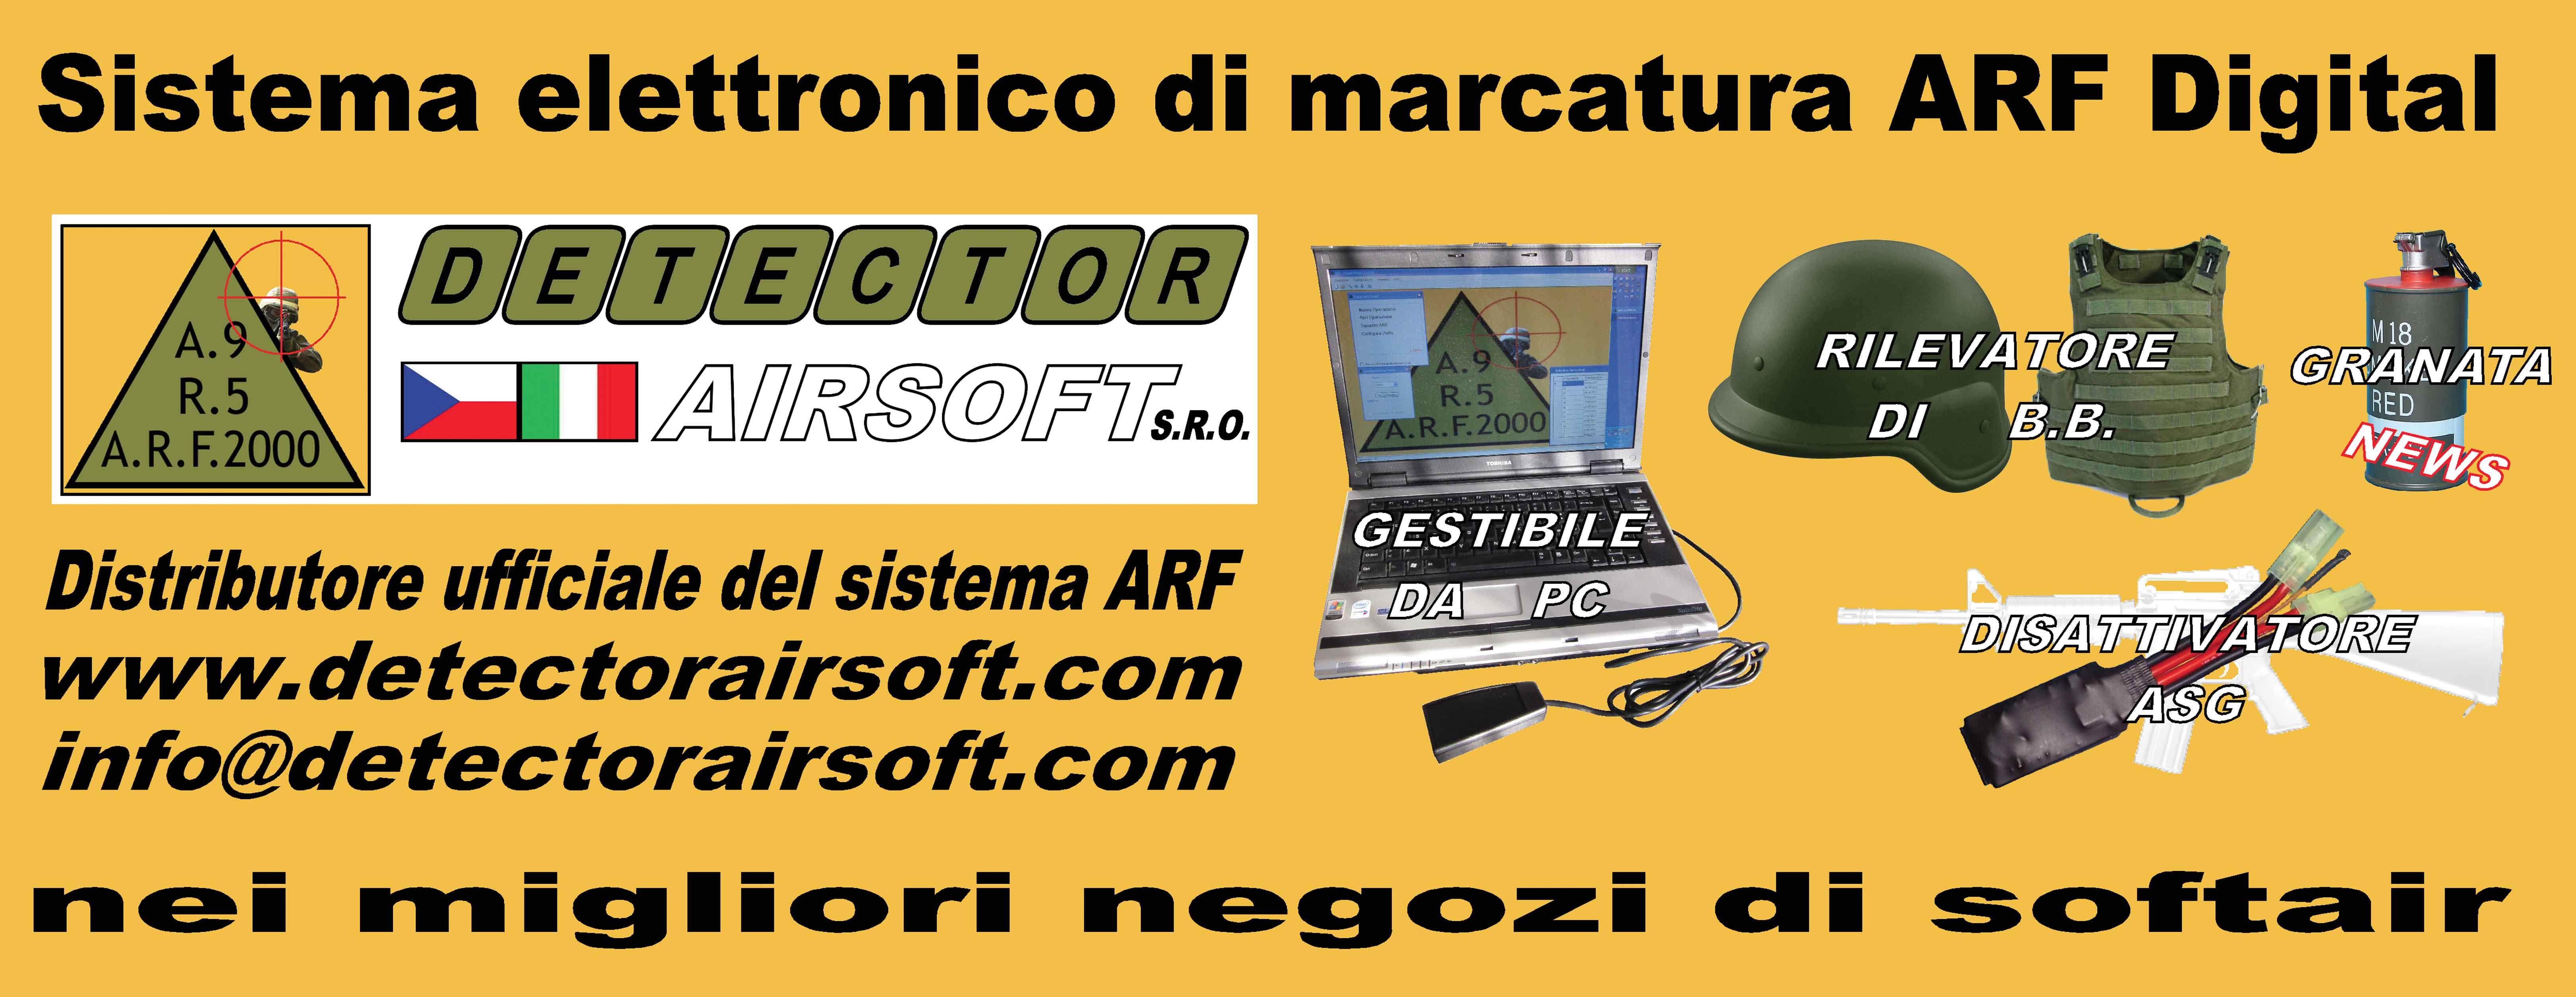 ARF-advertising